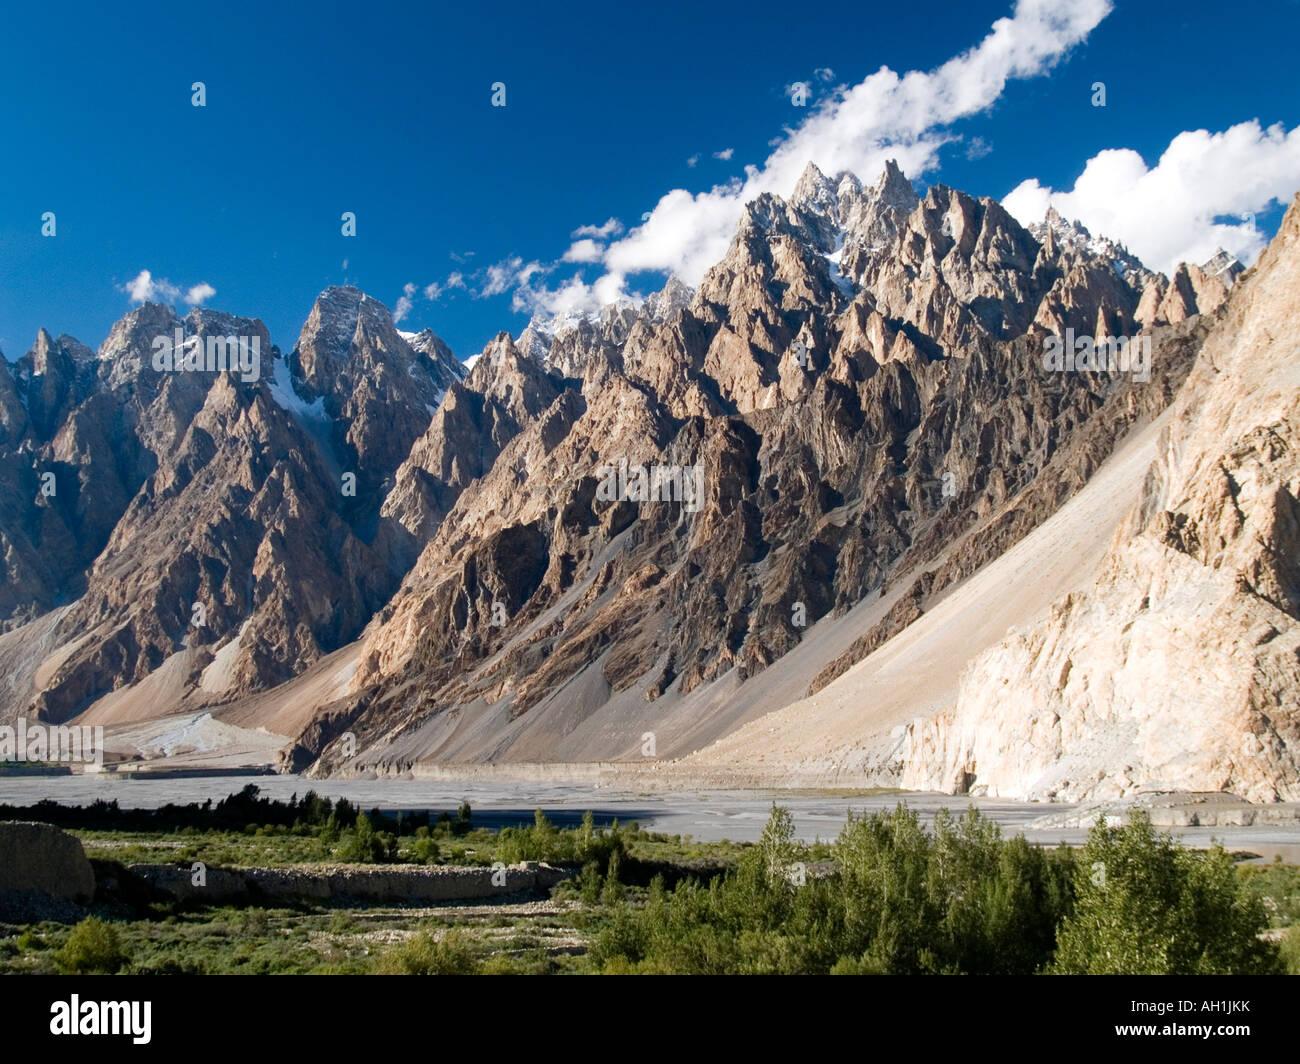 the majestic Passu Cathedrals in the Karakoram Mountains Pakistan - Stock Image